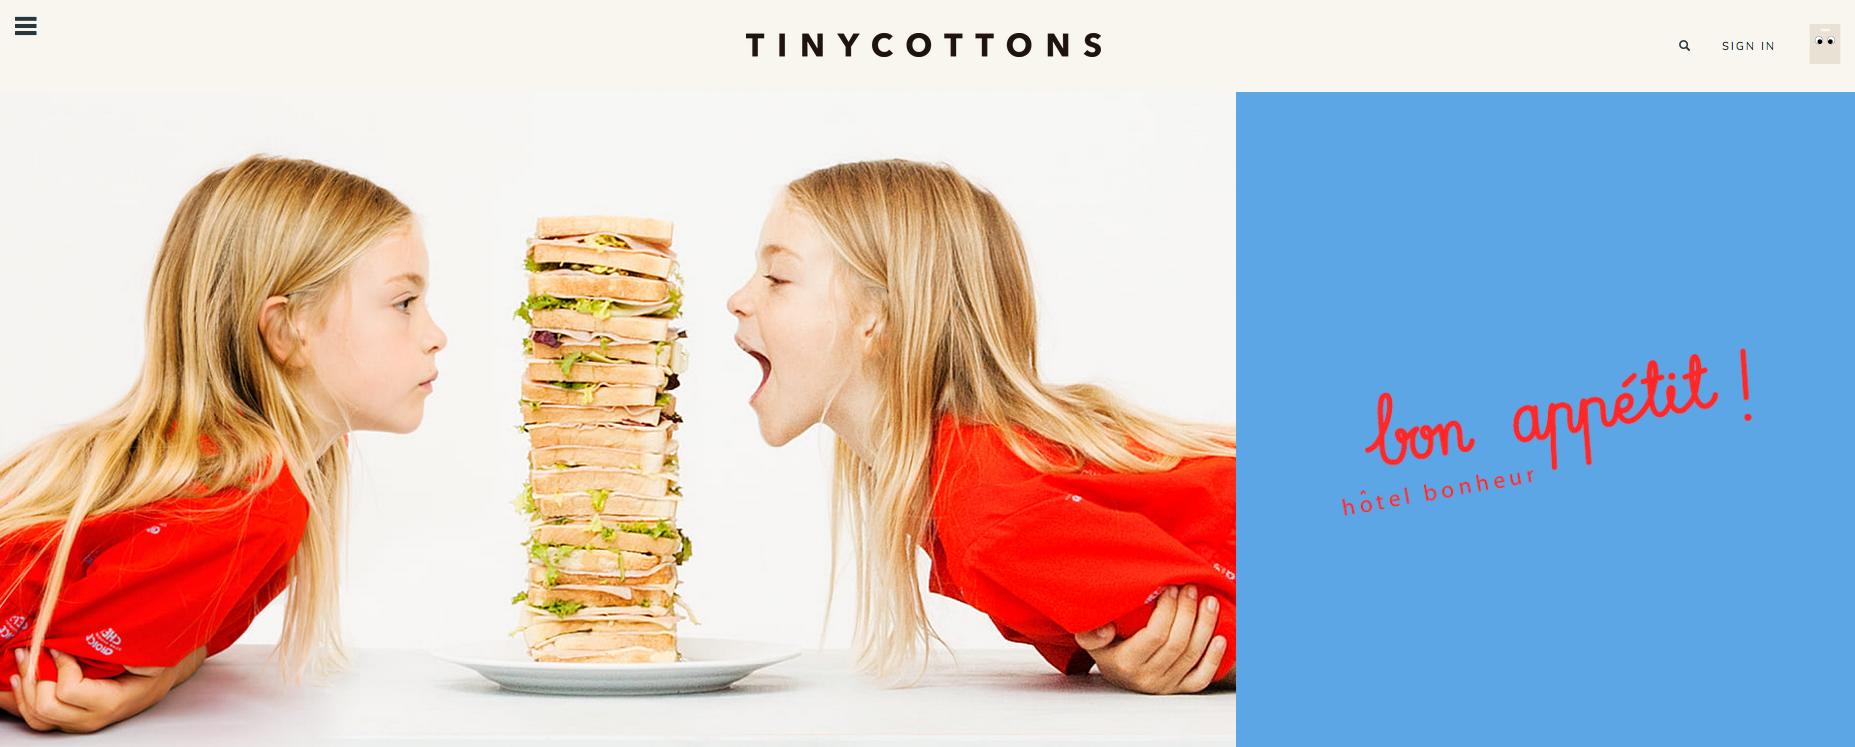 Tynicottons